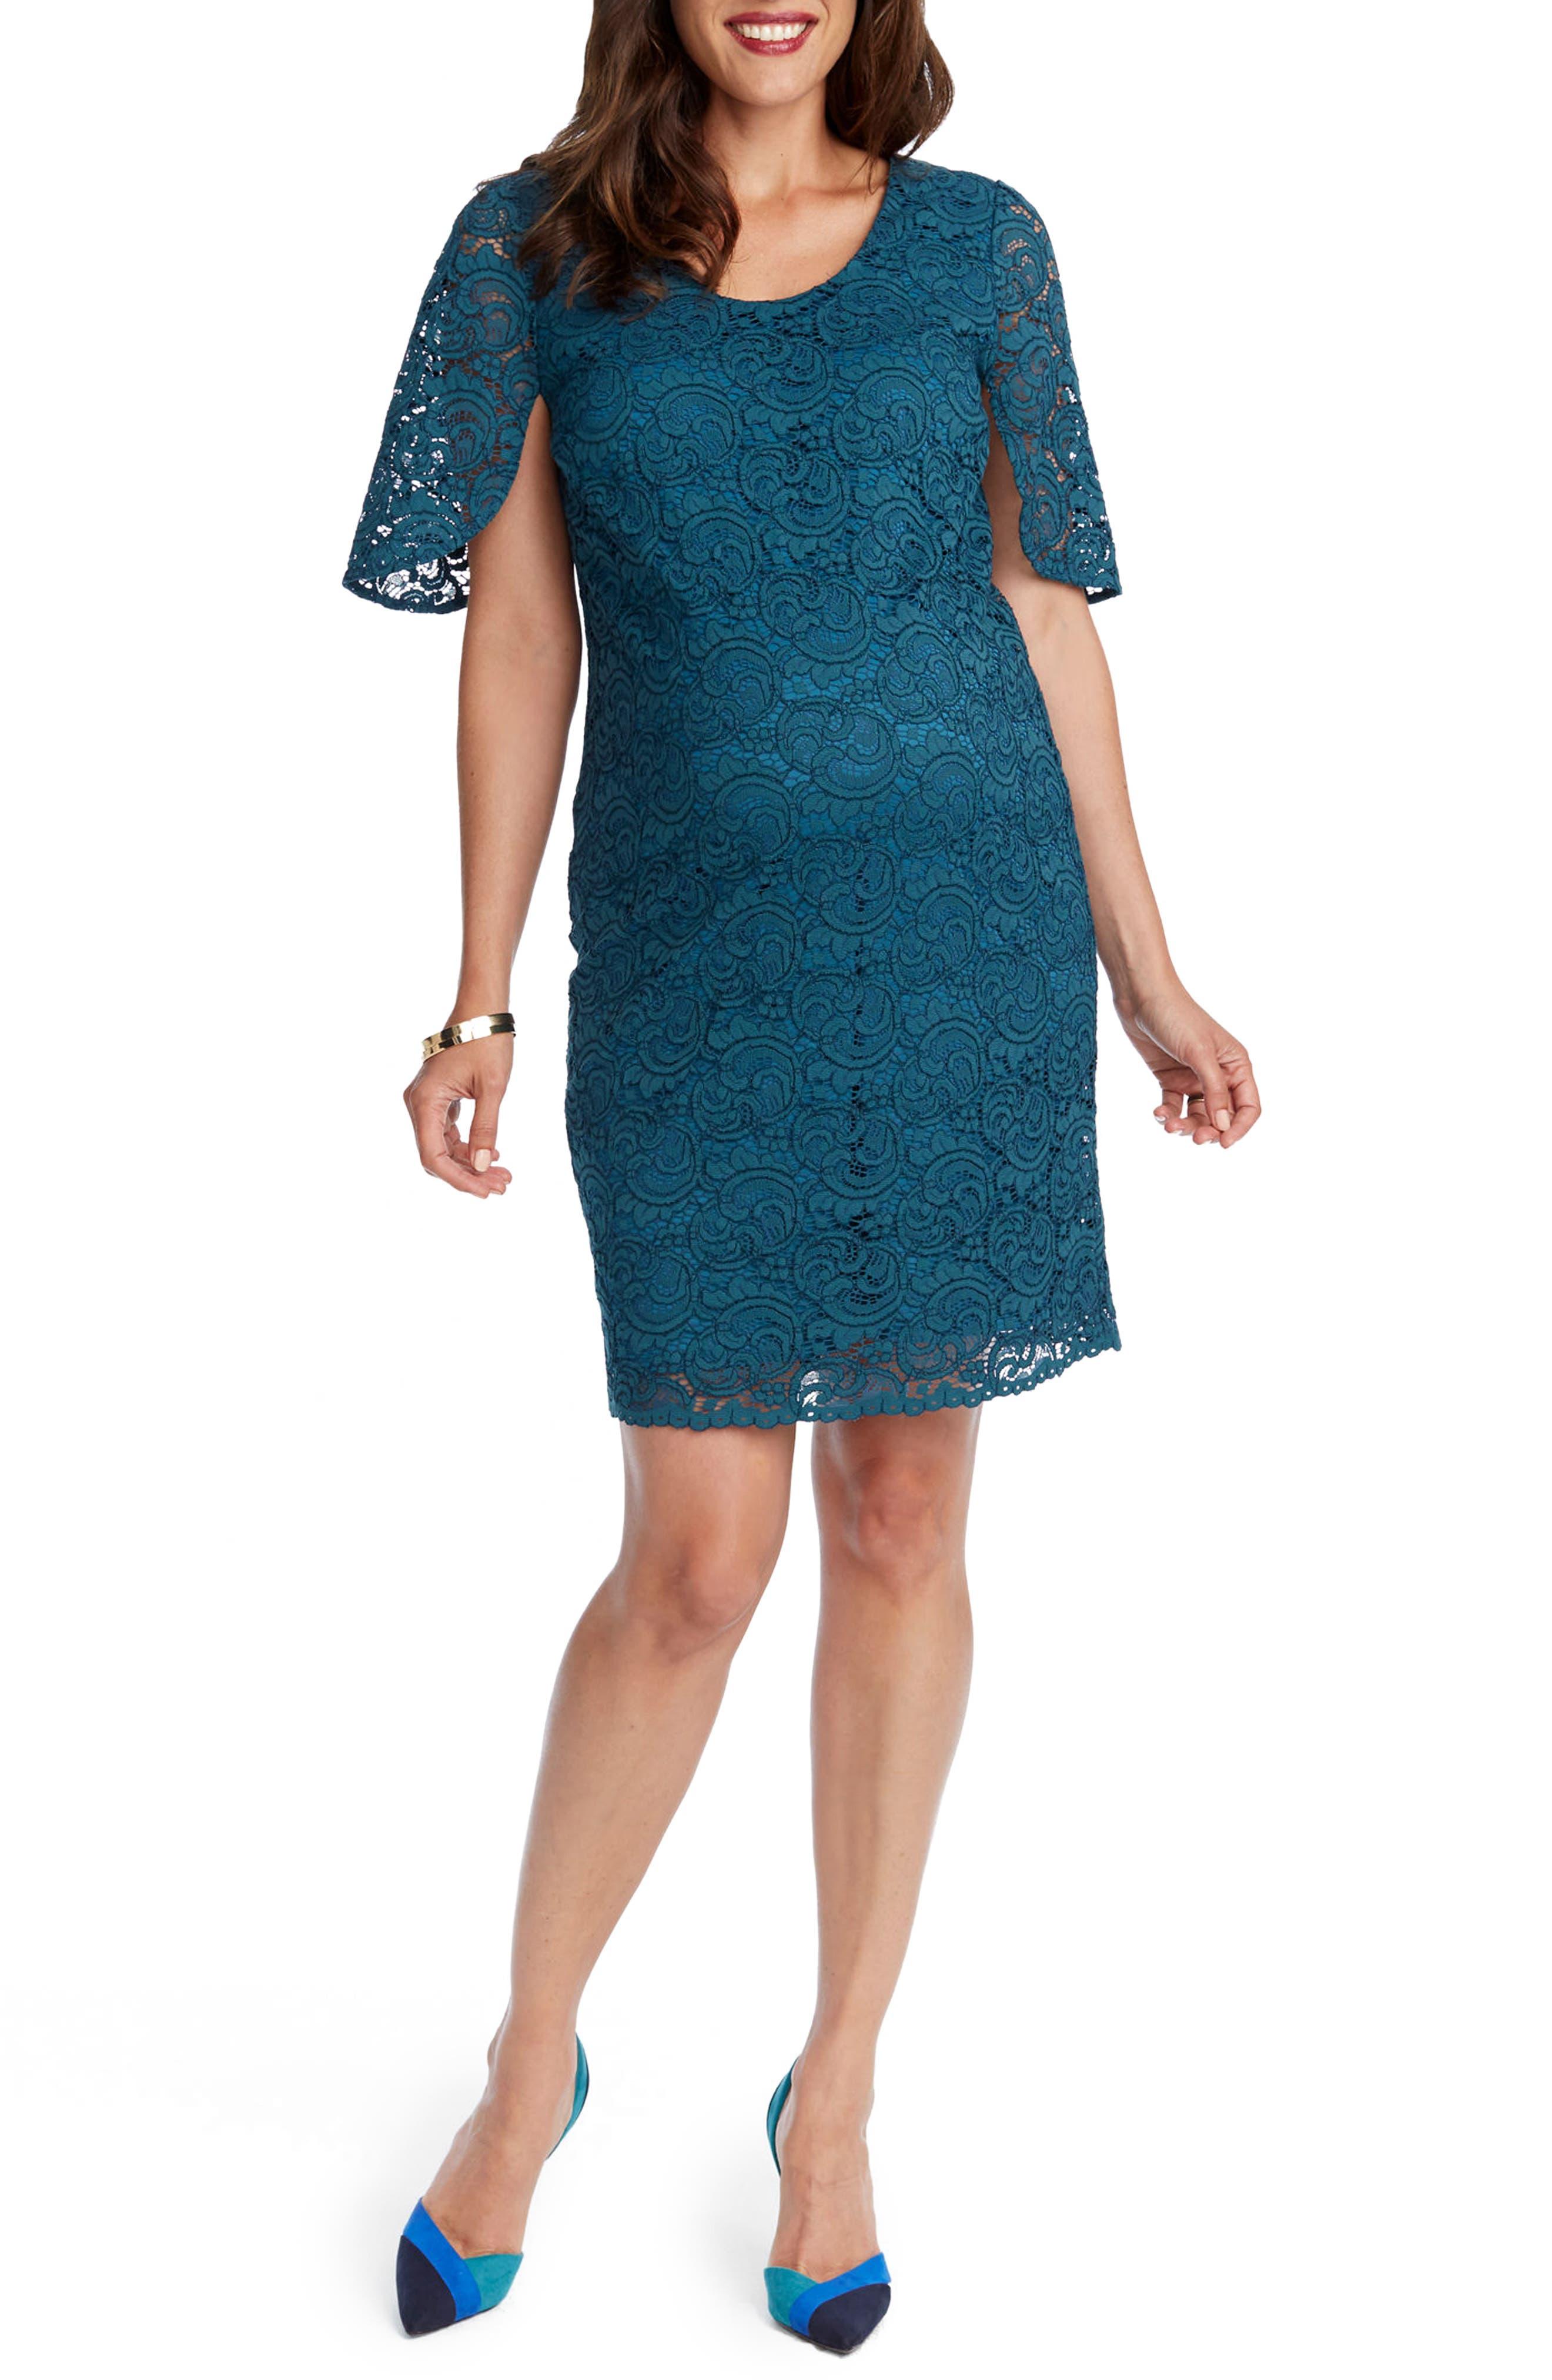 Image of Rosie Pope Lainey Lace Maternity Sheath Dress